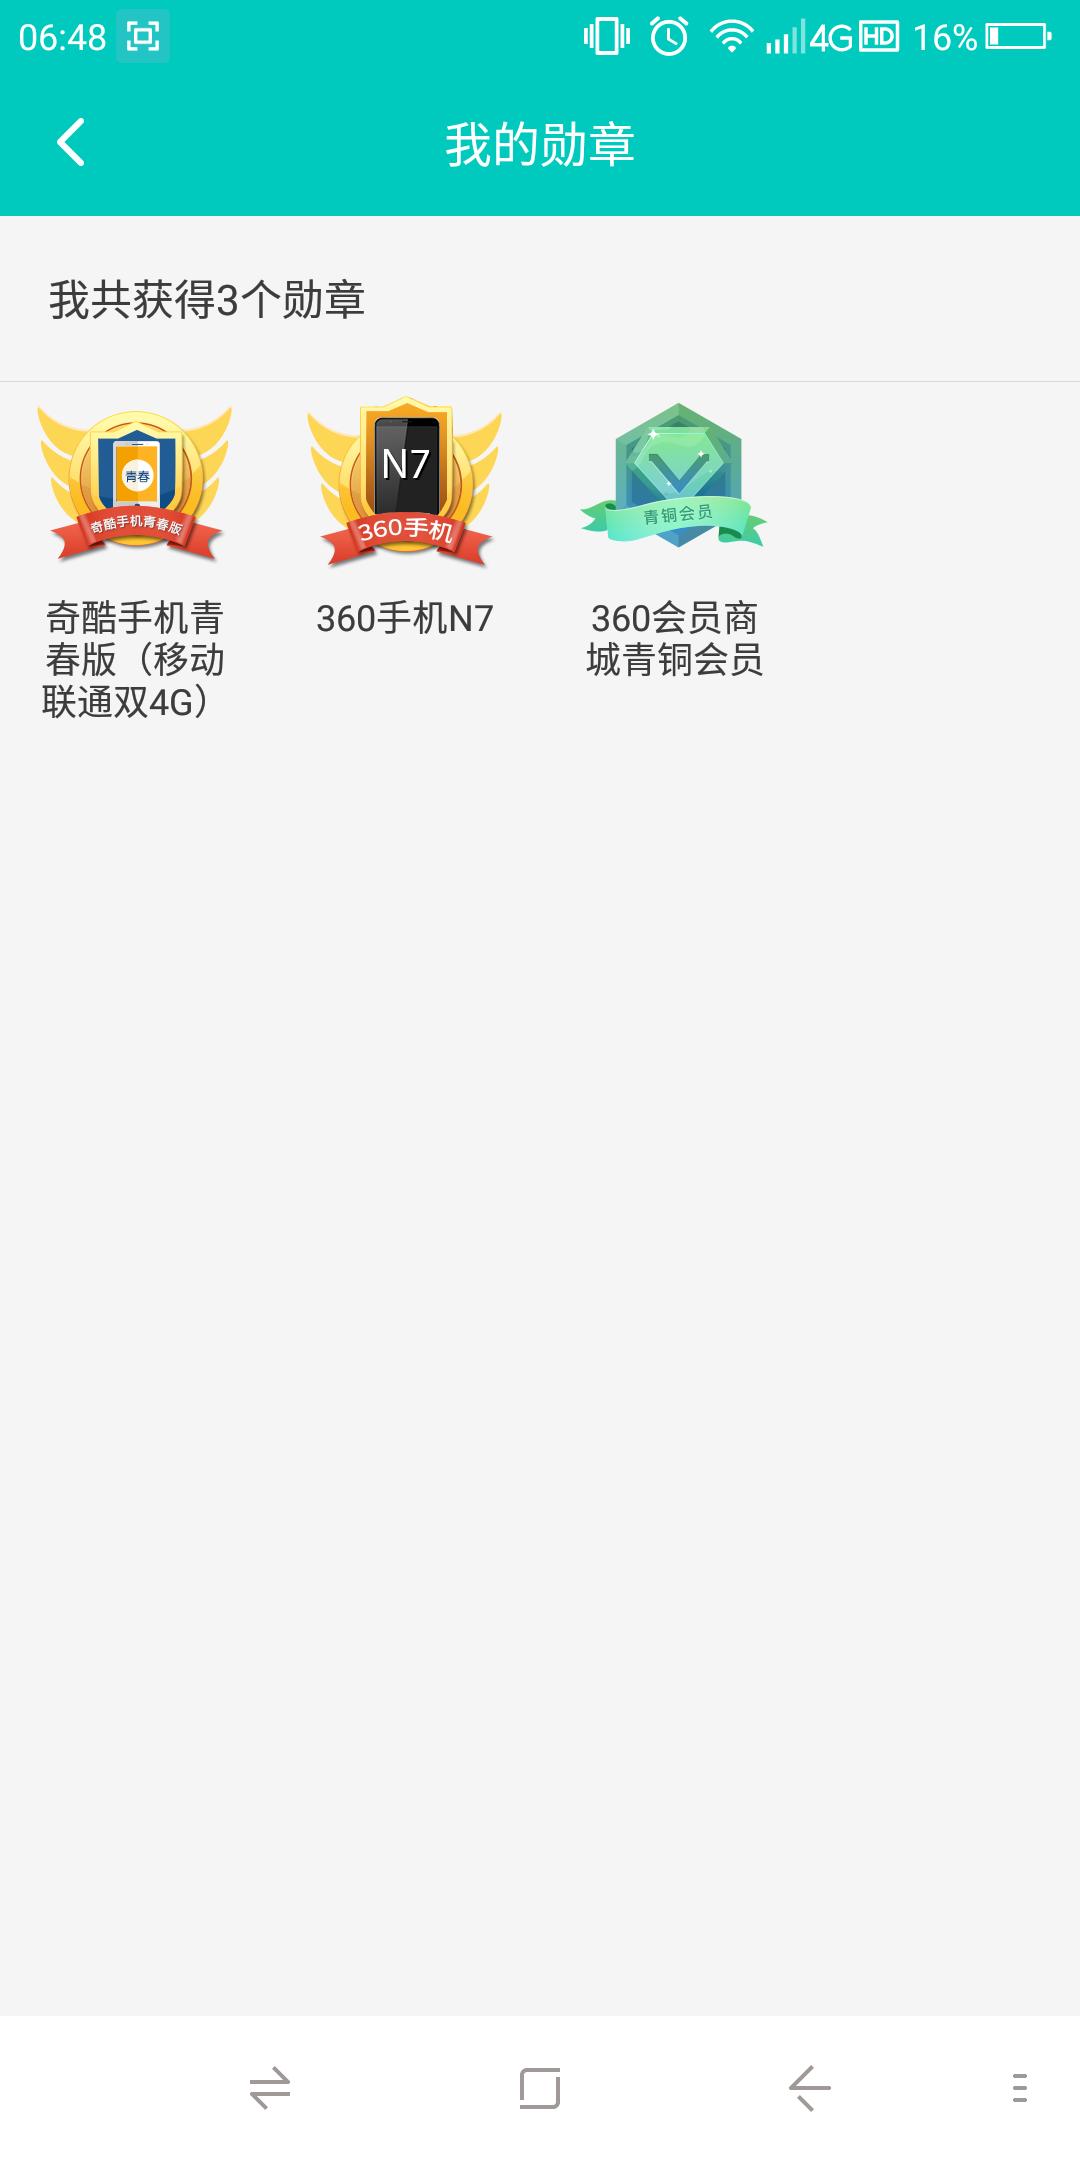 Screenshot_2019-09-07-06-48-19.png